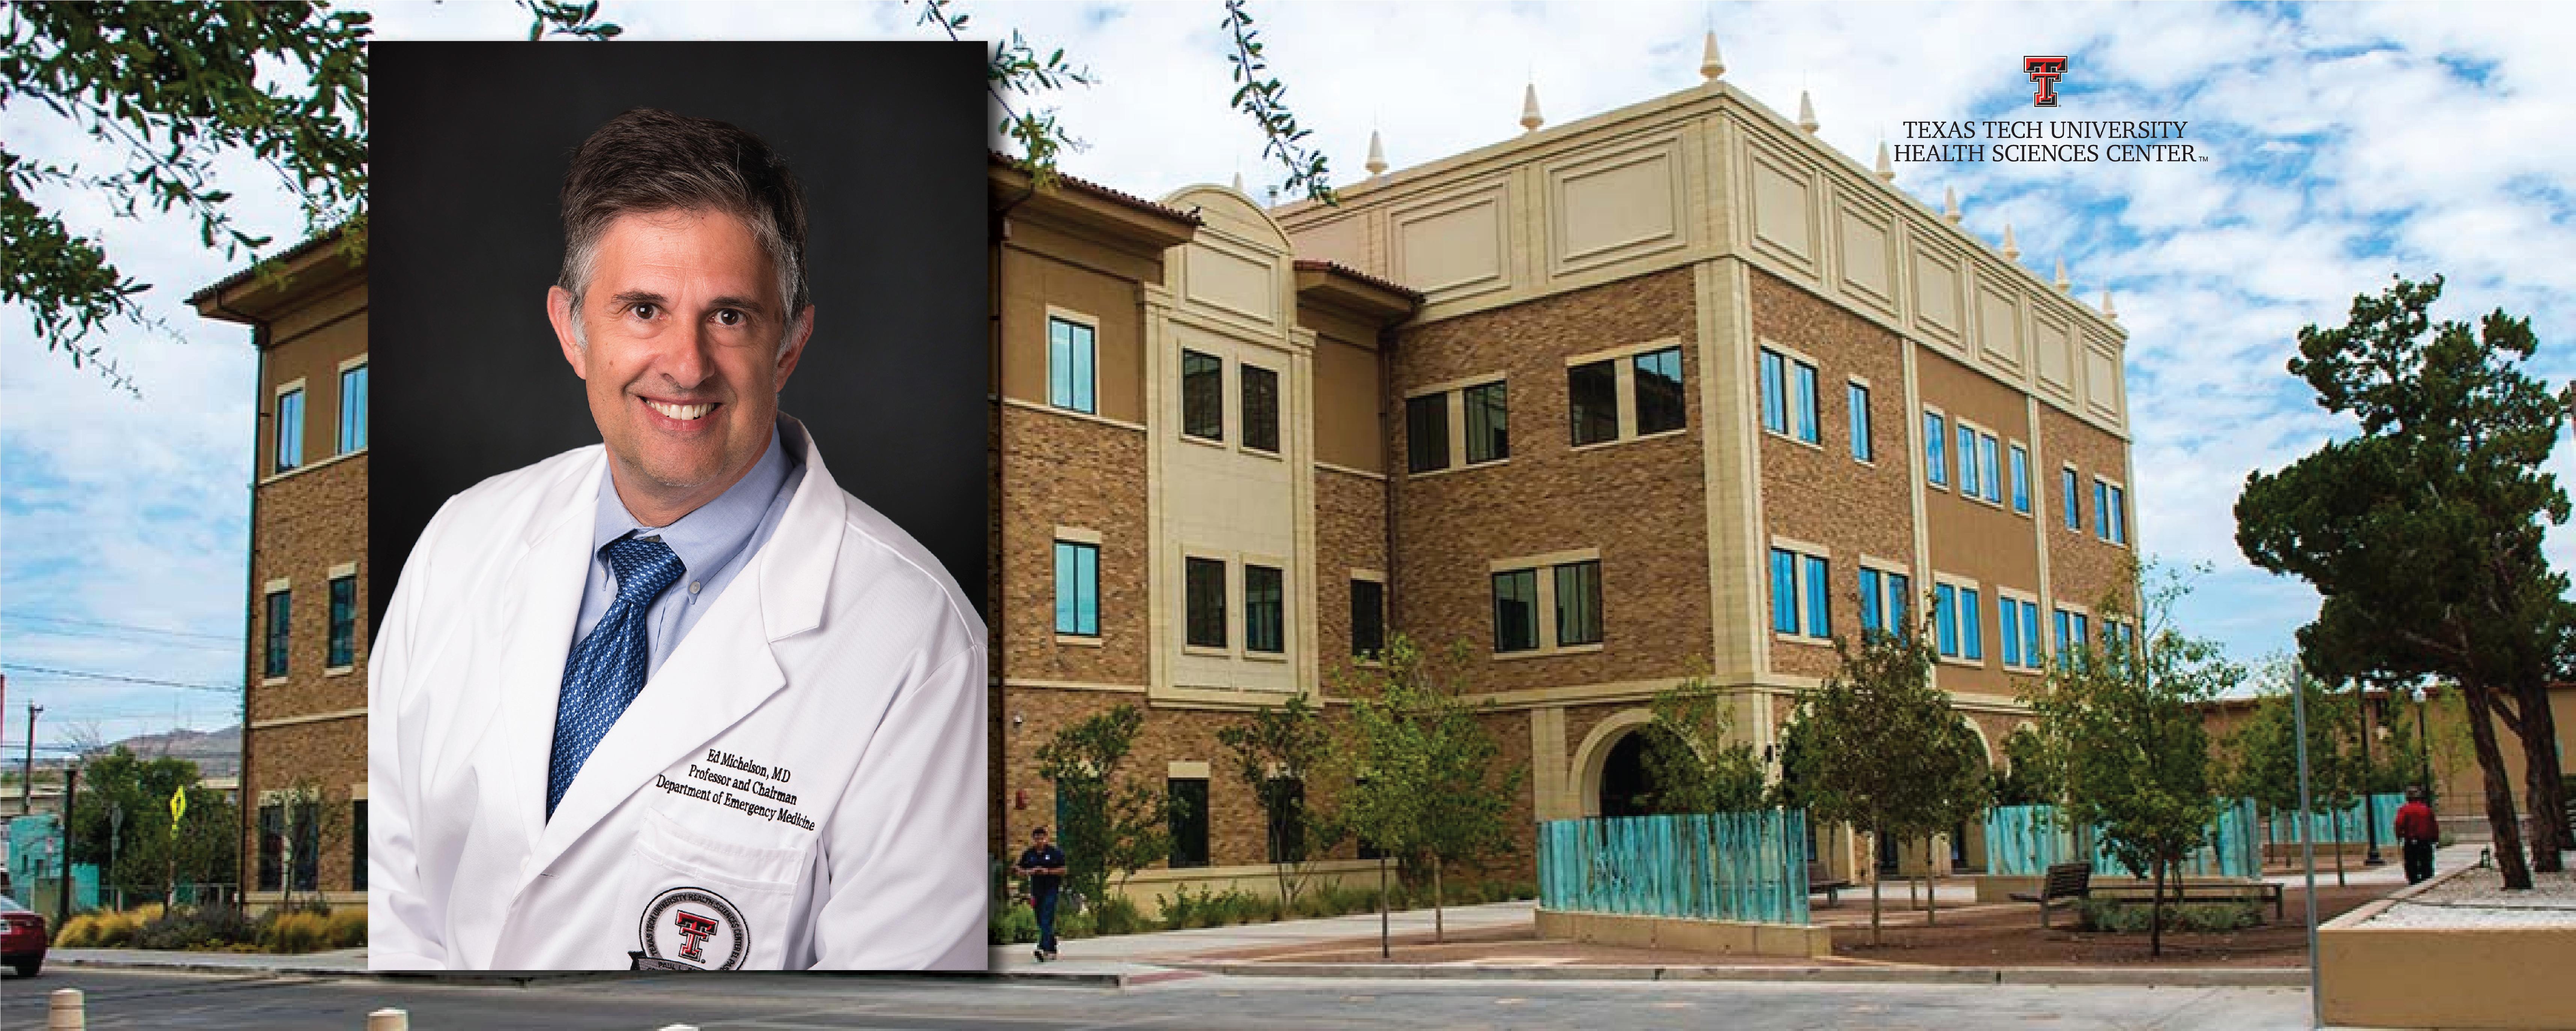 Dr. Edward Michelson – COVID TTUHSC – Photo of Edward Michelson courtesy of TTUHSC